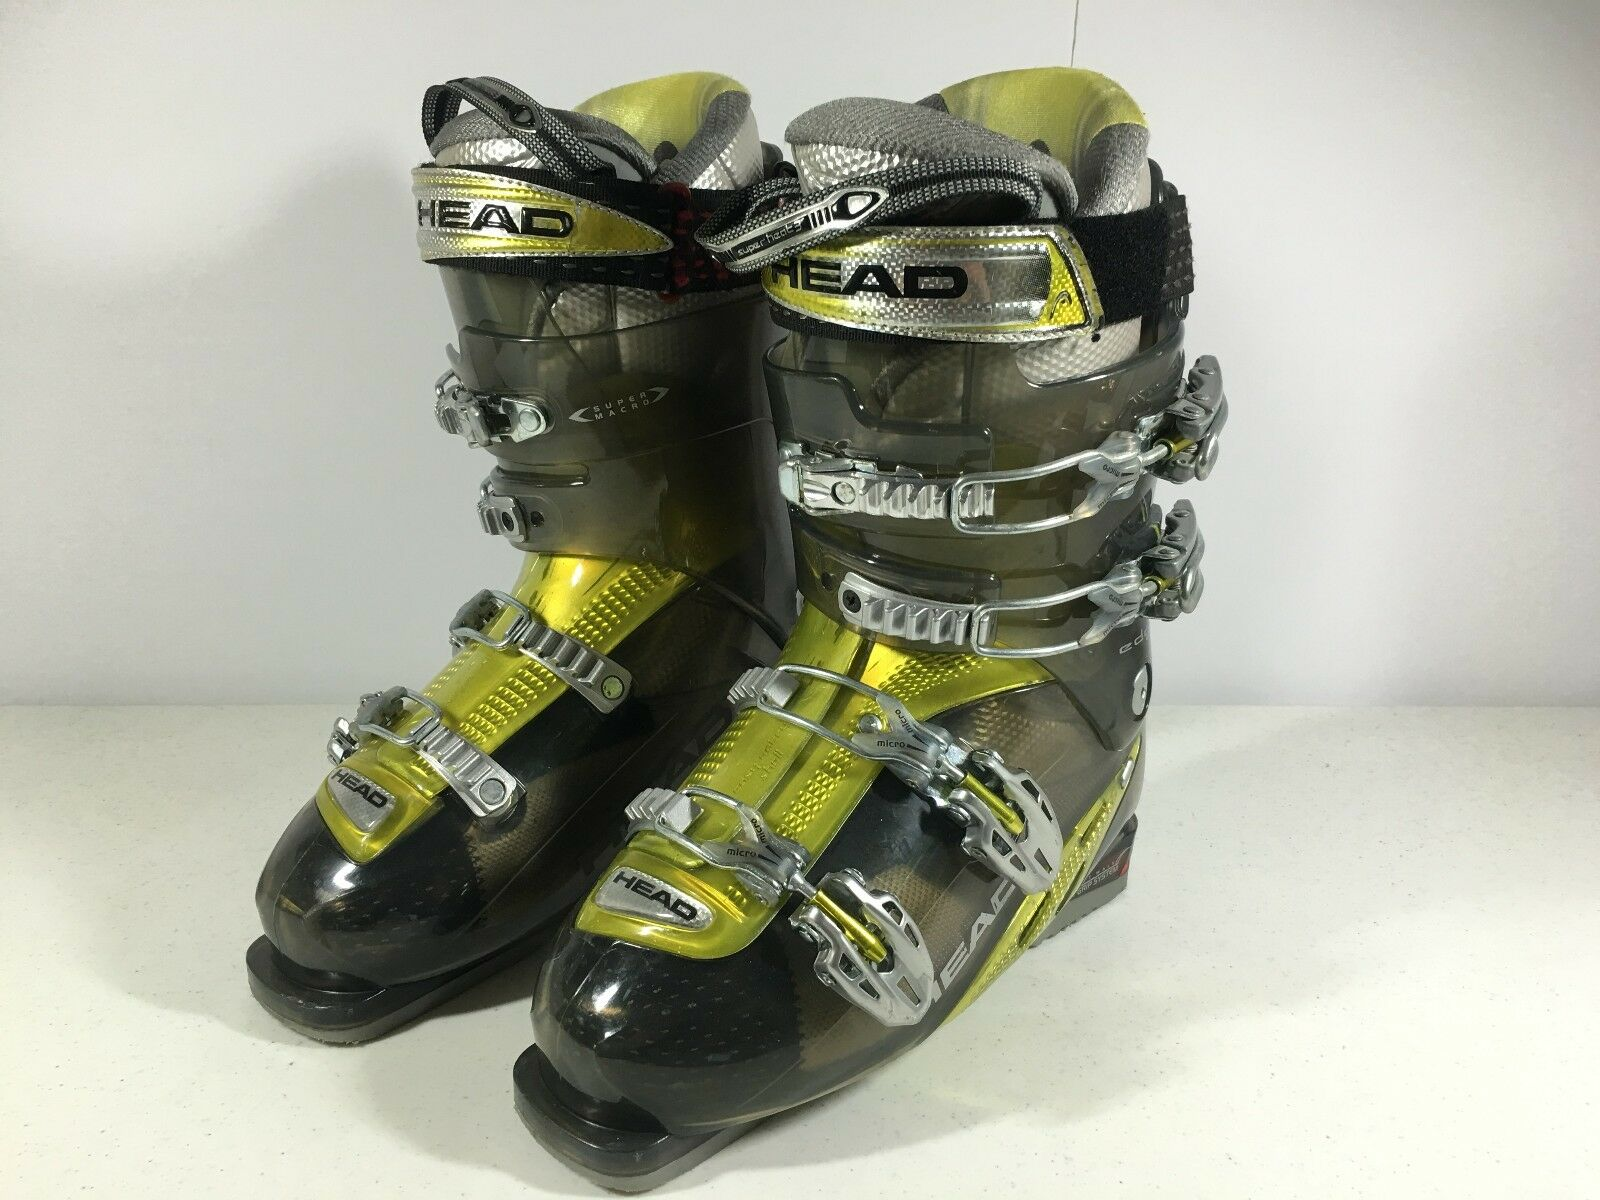 Head  Herren Ski Stiefel 27/27.5 Edge Superheat 3 5650 G167 317mm Designed in